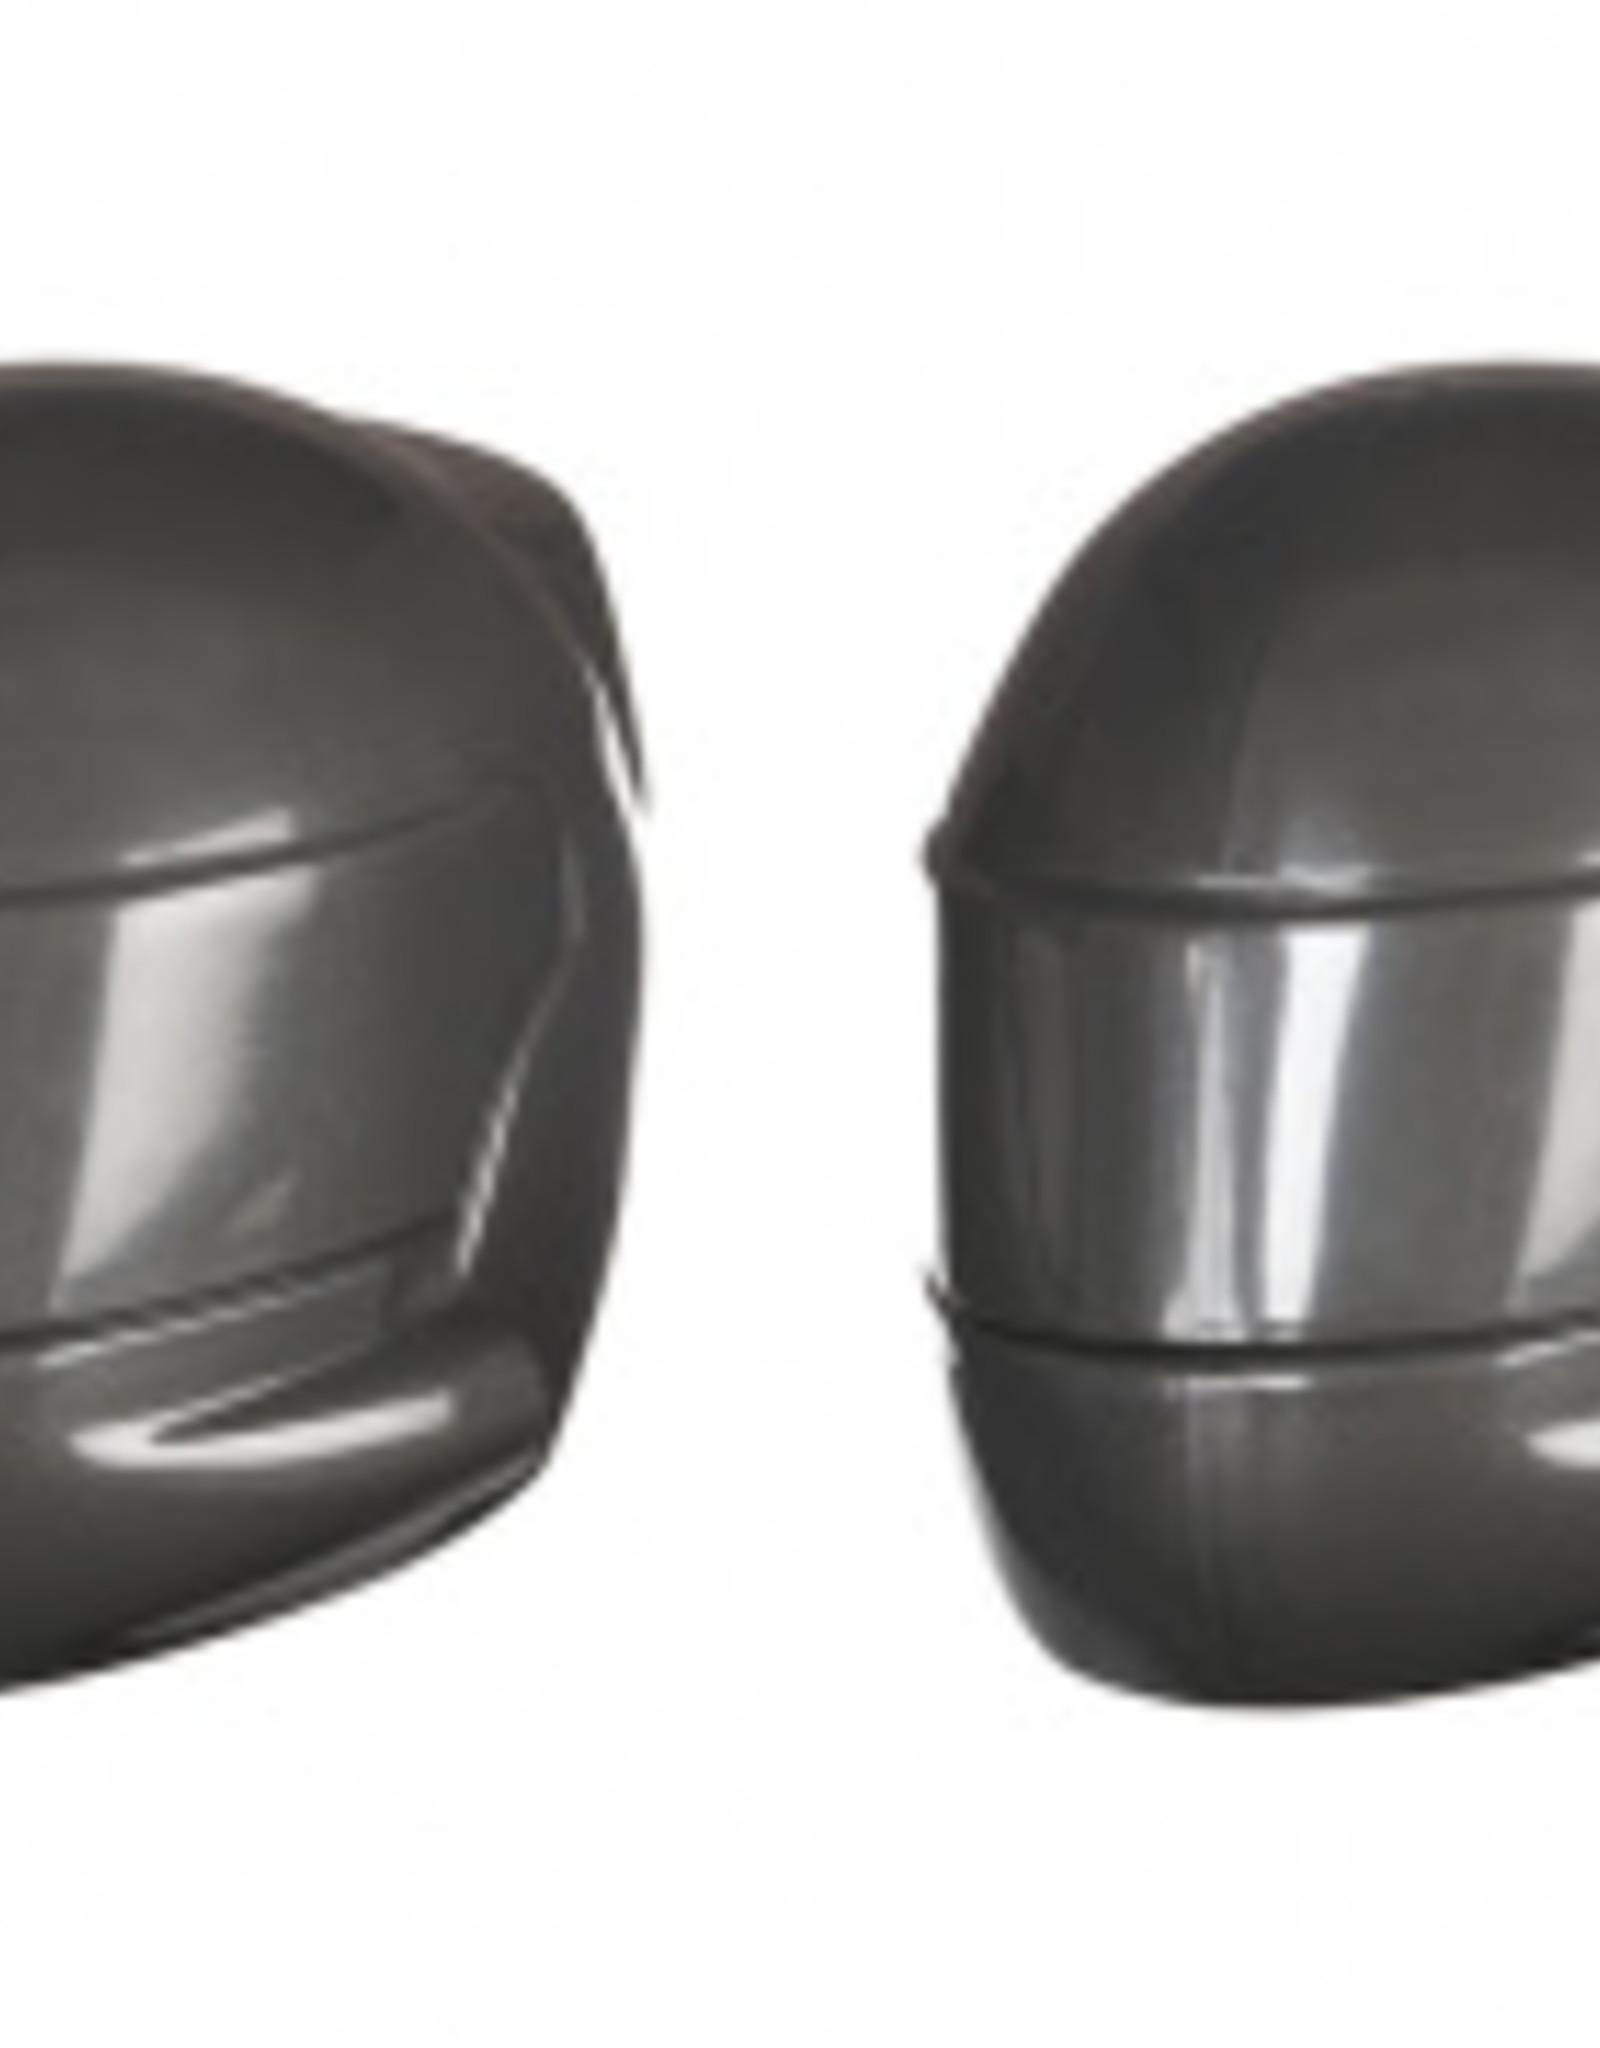 Traxxas Traxxas Unlimited Desert Racer Driver helmet, grey (2)